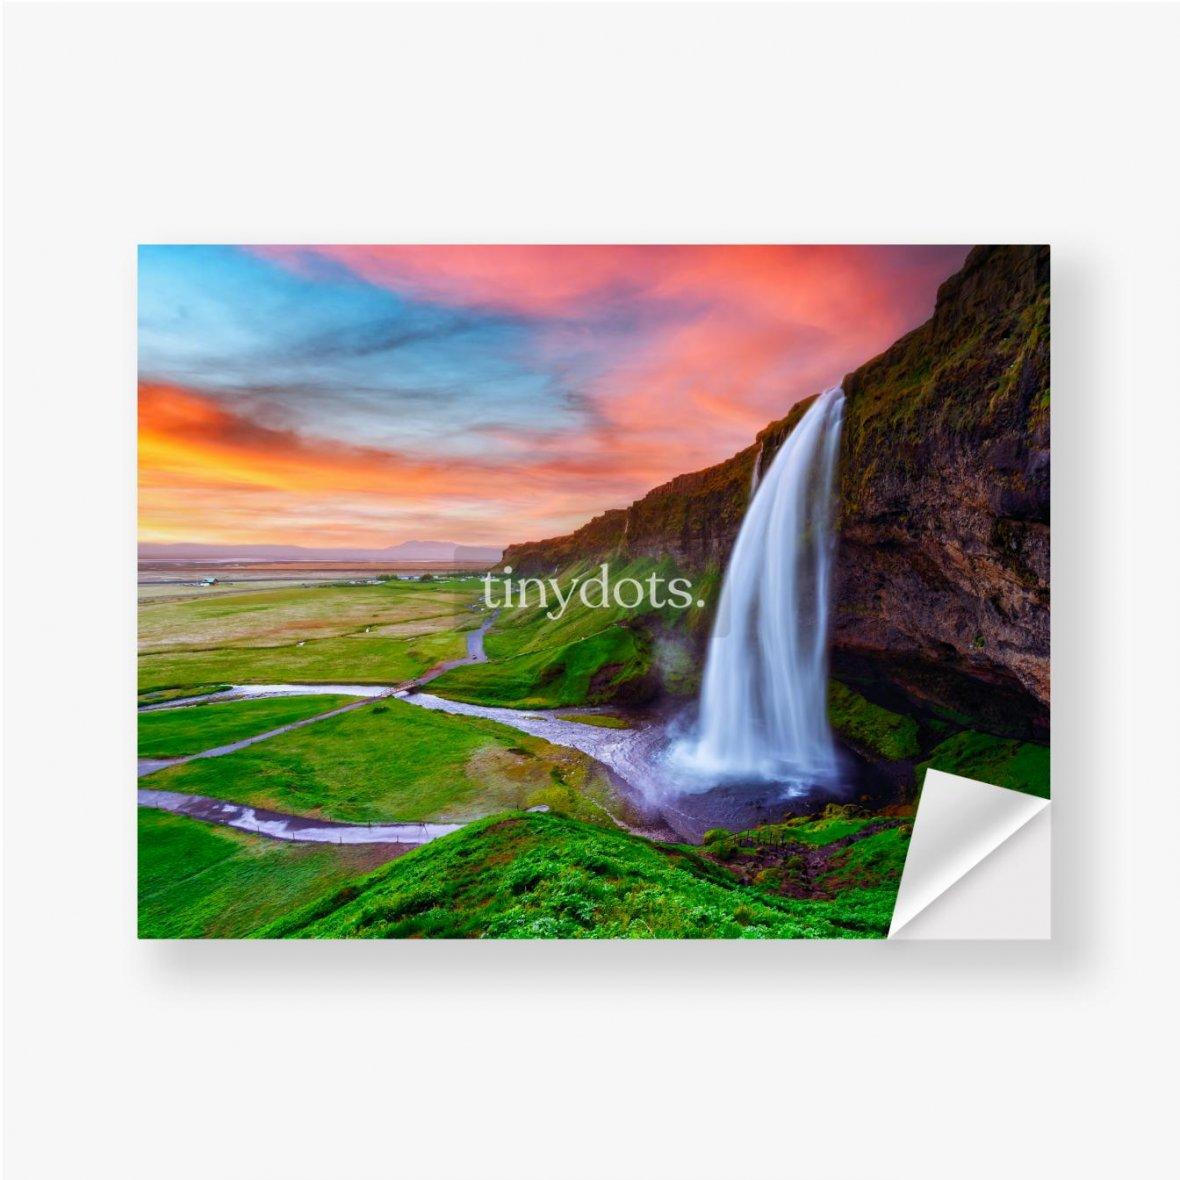 Aufkleber Sonnenaufgang auf Seljalandfoss Wasserfall auf Seljalandsa Fluss, Island, Europa. Erstaunliche Aussicht von innen. Landschaftsfo